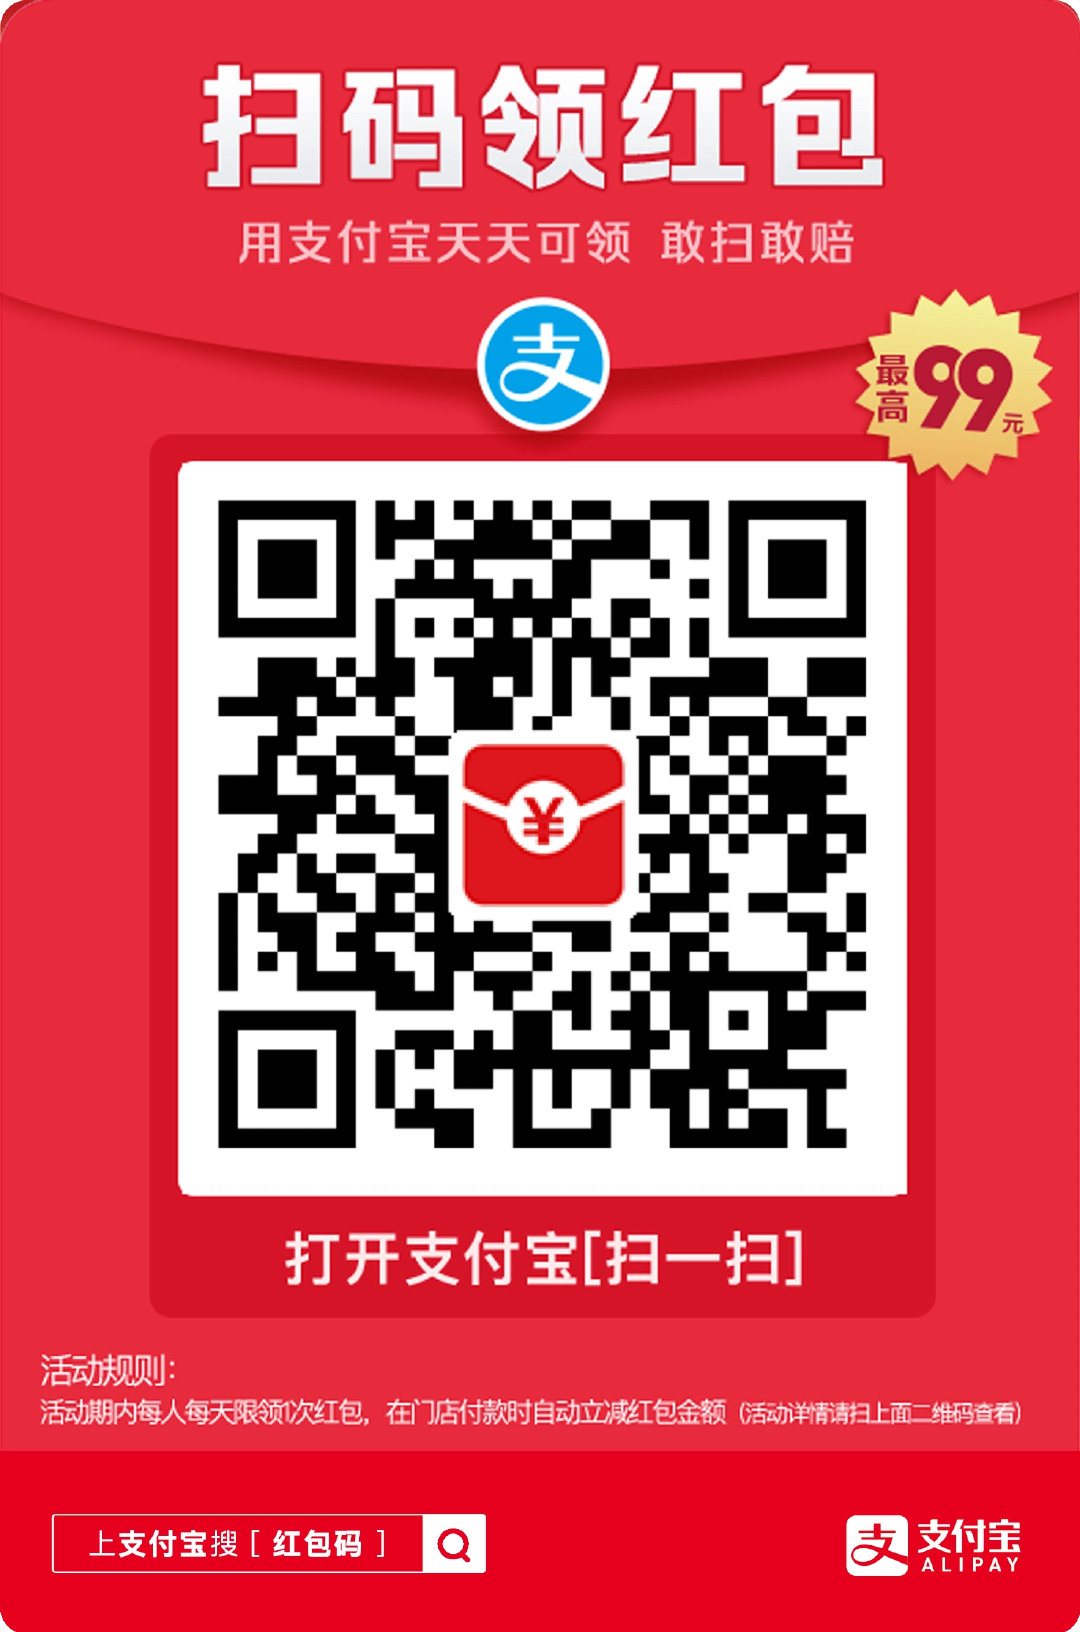 nur kirguzguch维吾尔语输入法手机版app